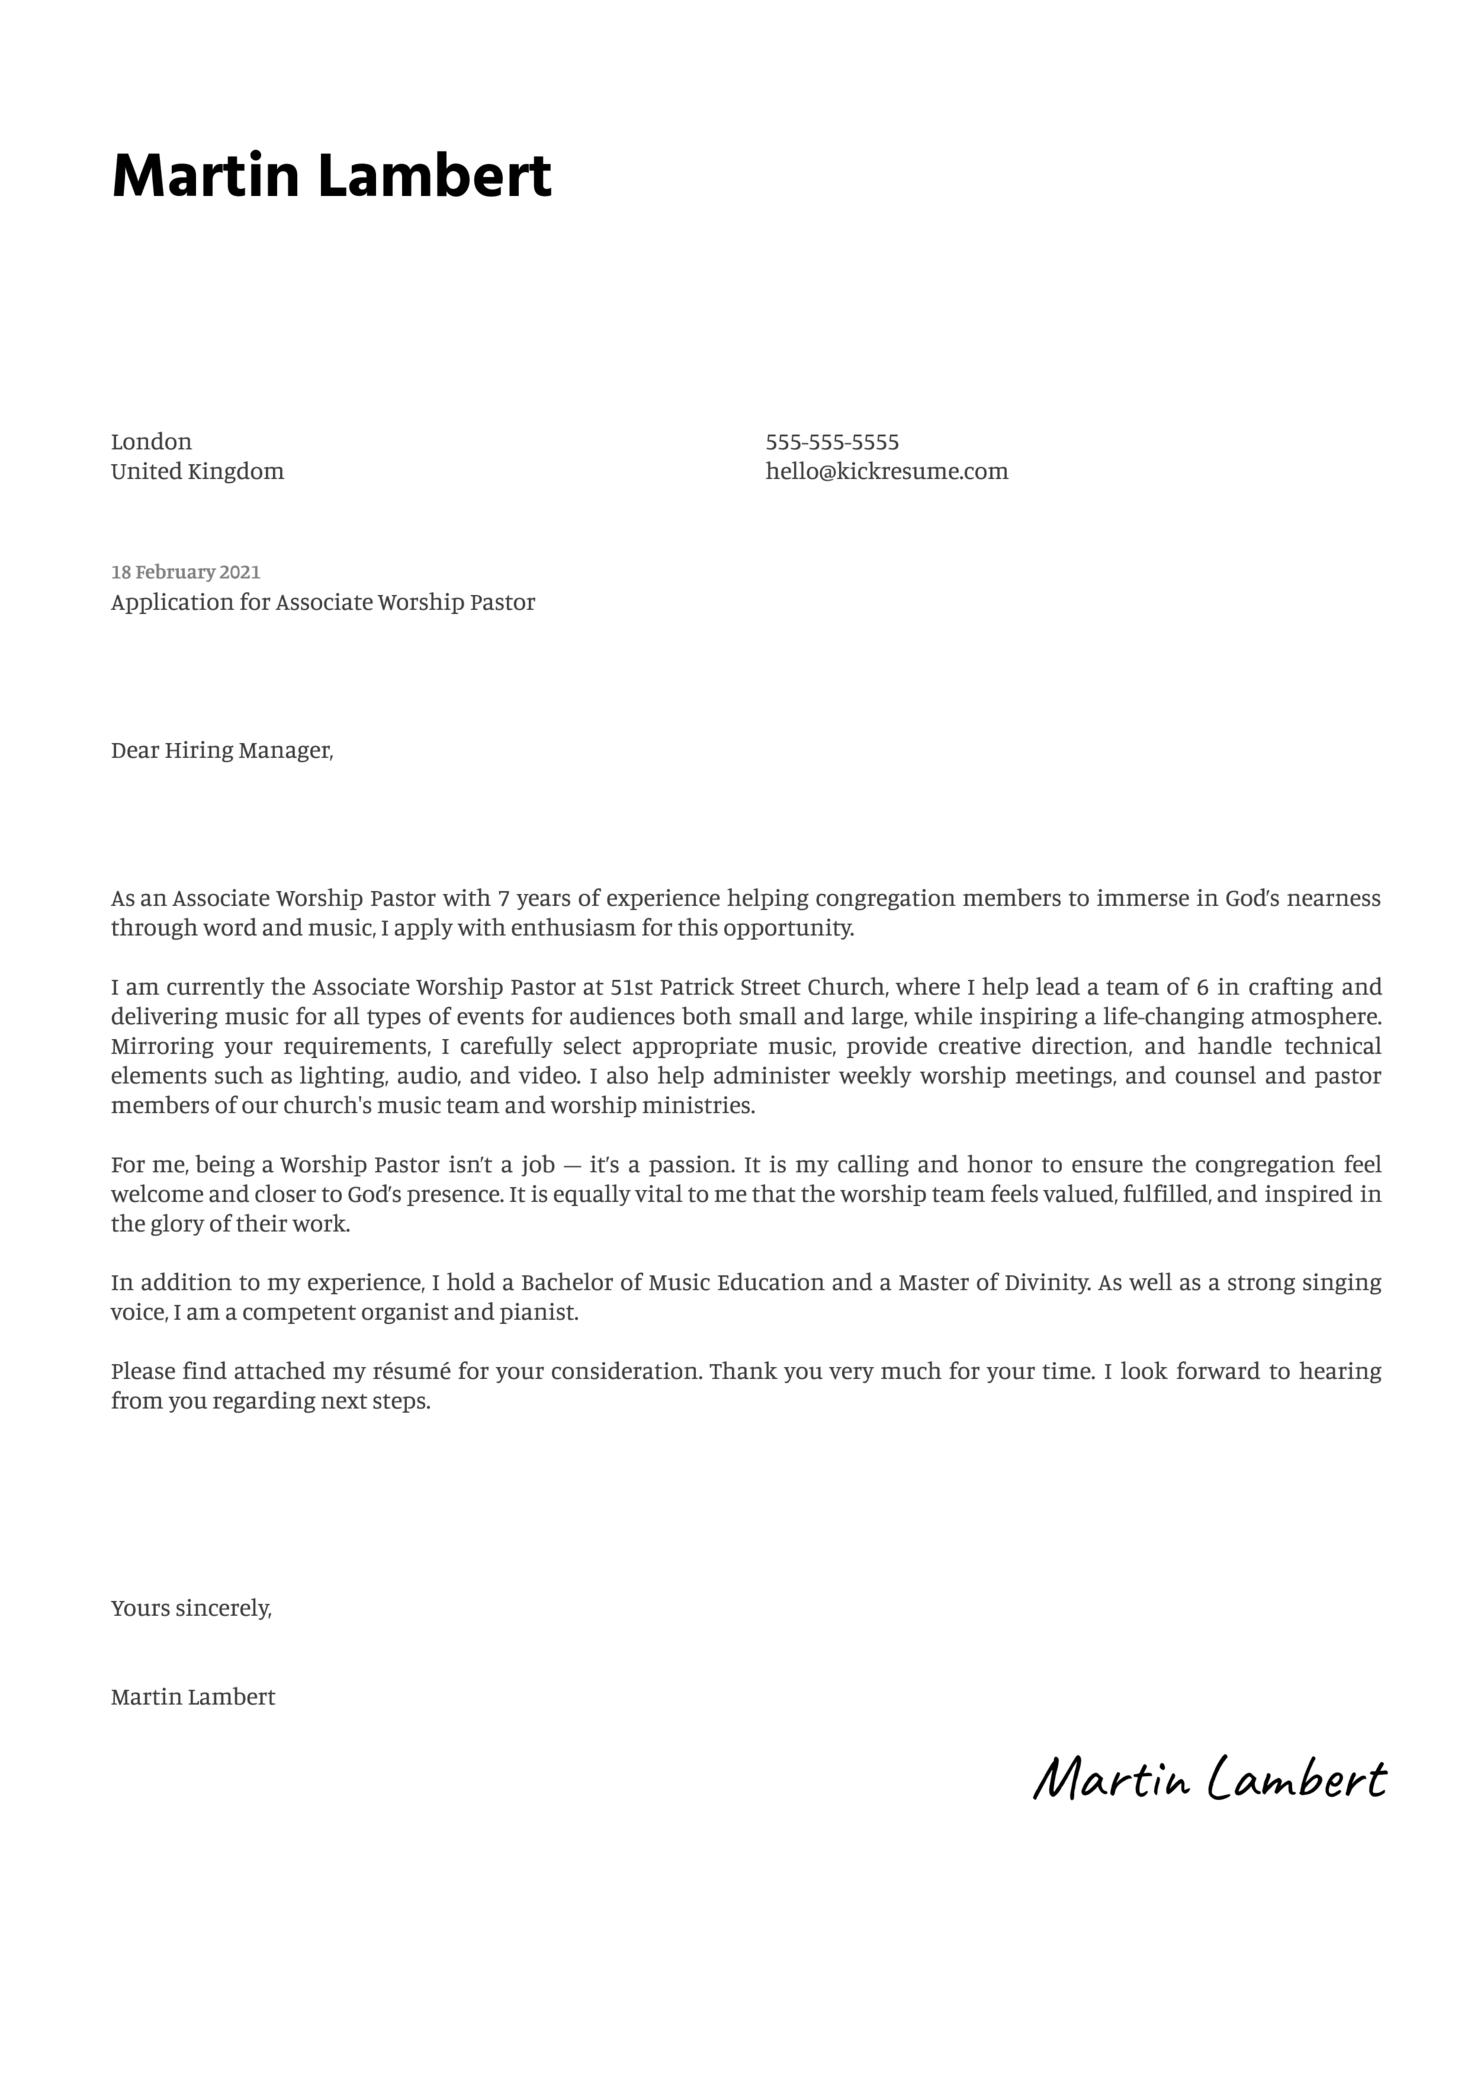 Associate Worship Pastor Cover Letter Template